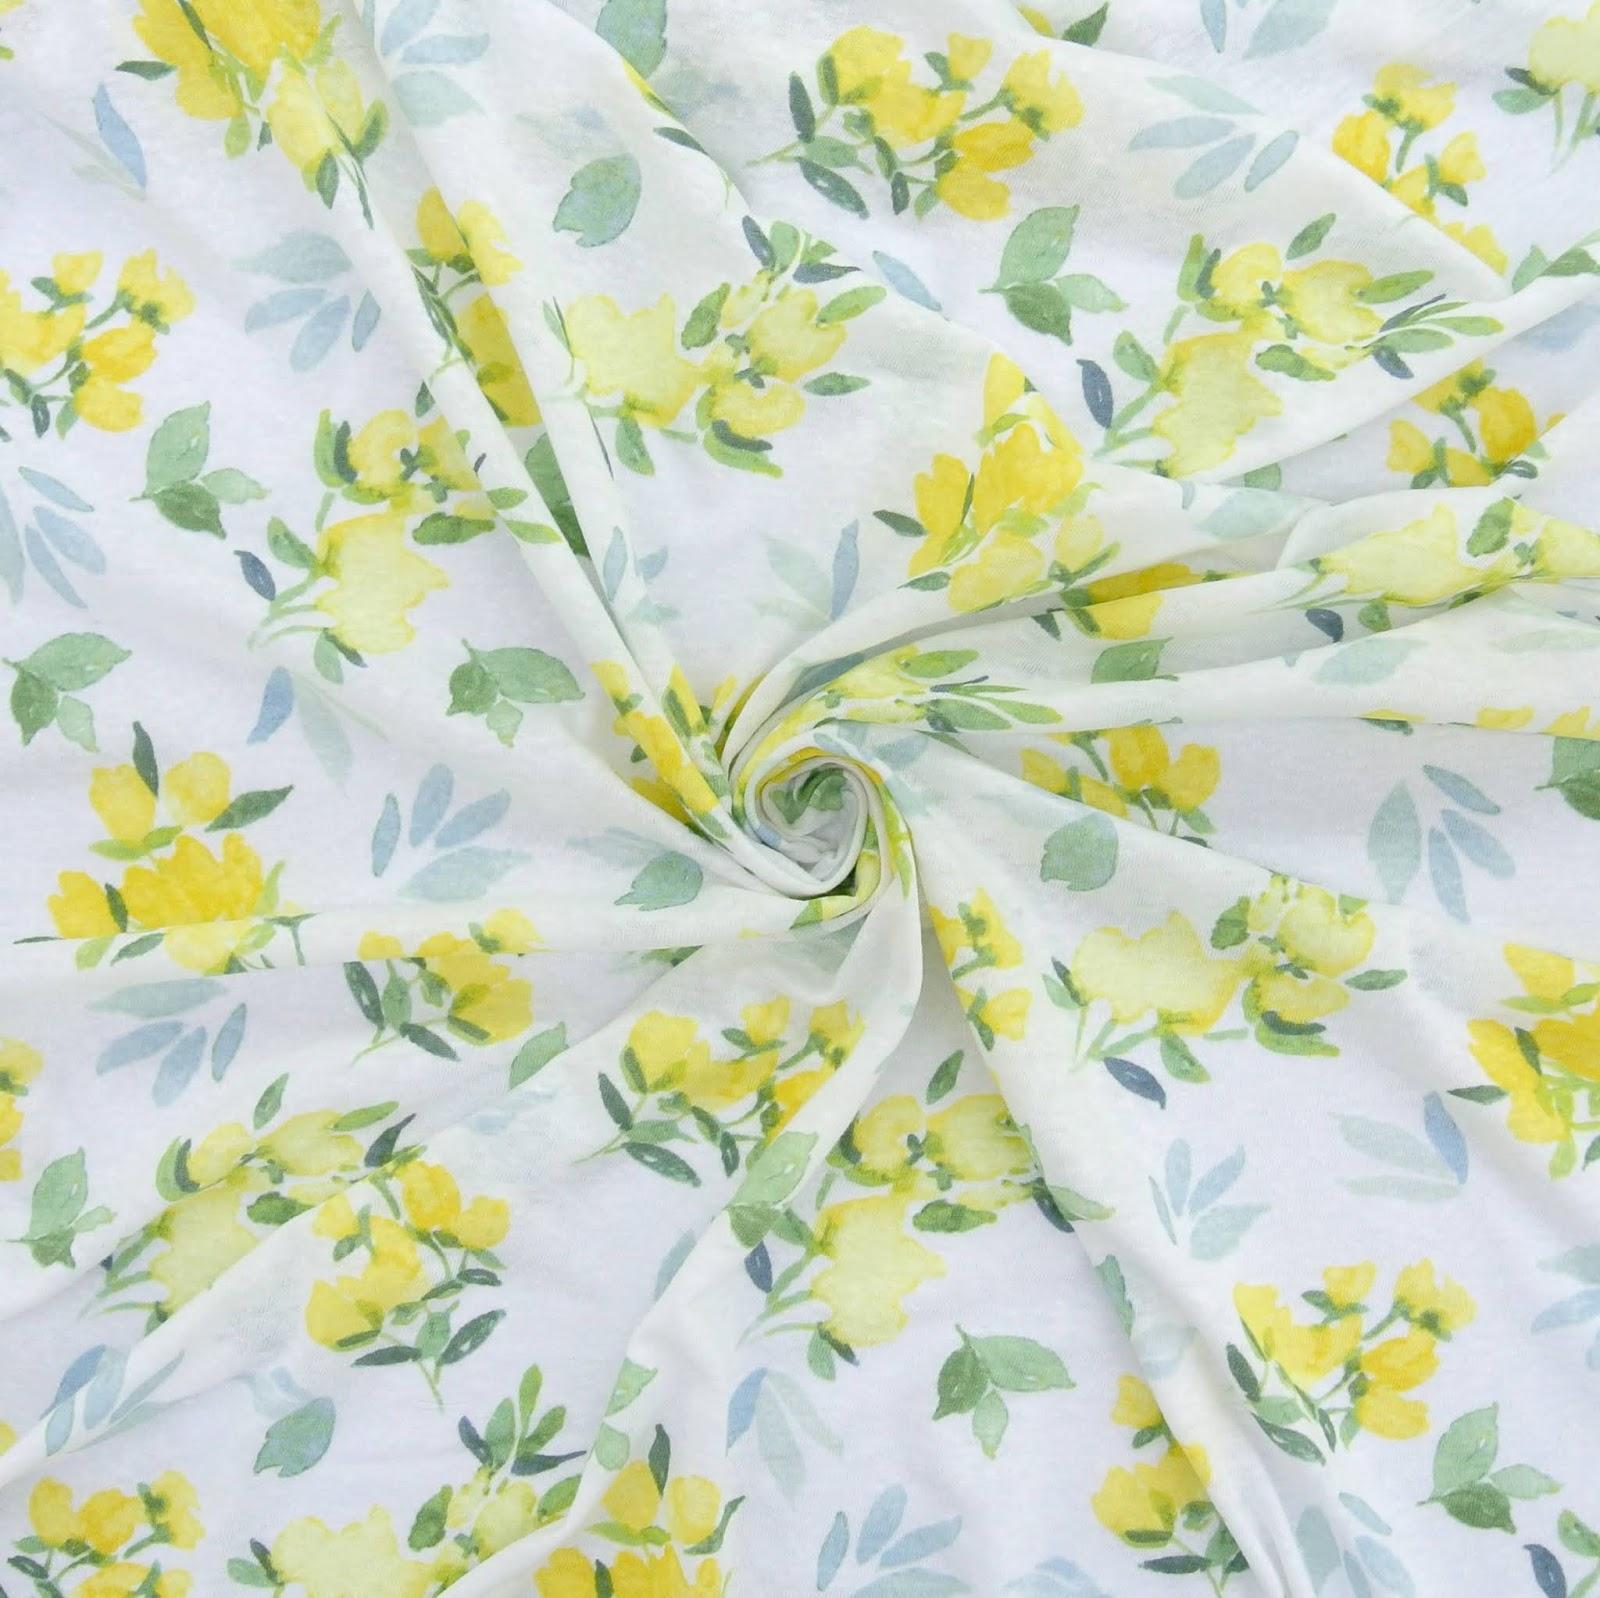 Treadle Yard Goods Slub Knit Prints